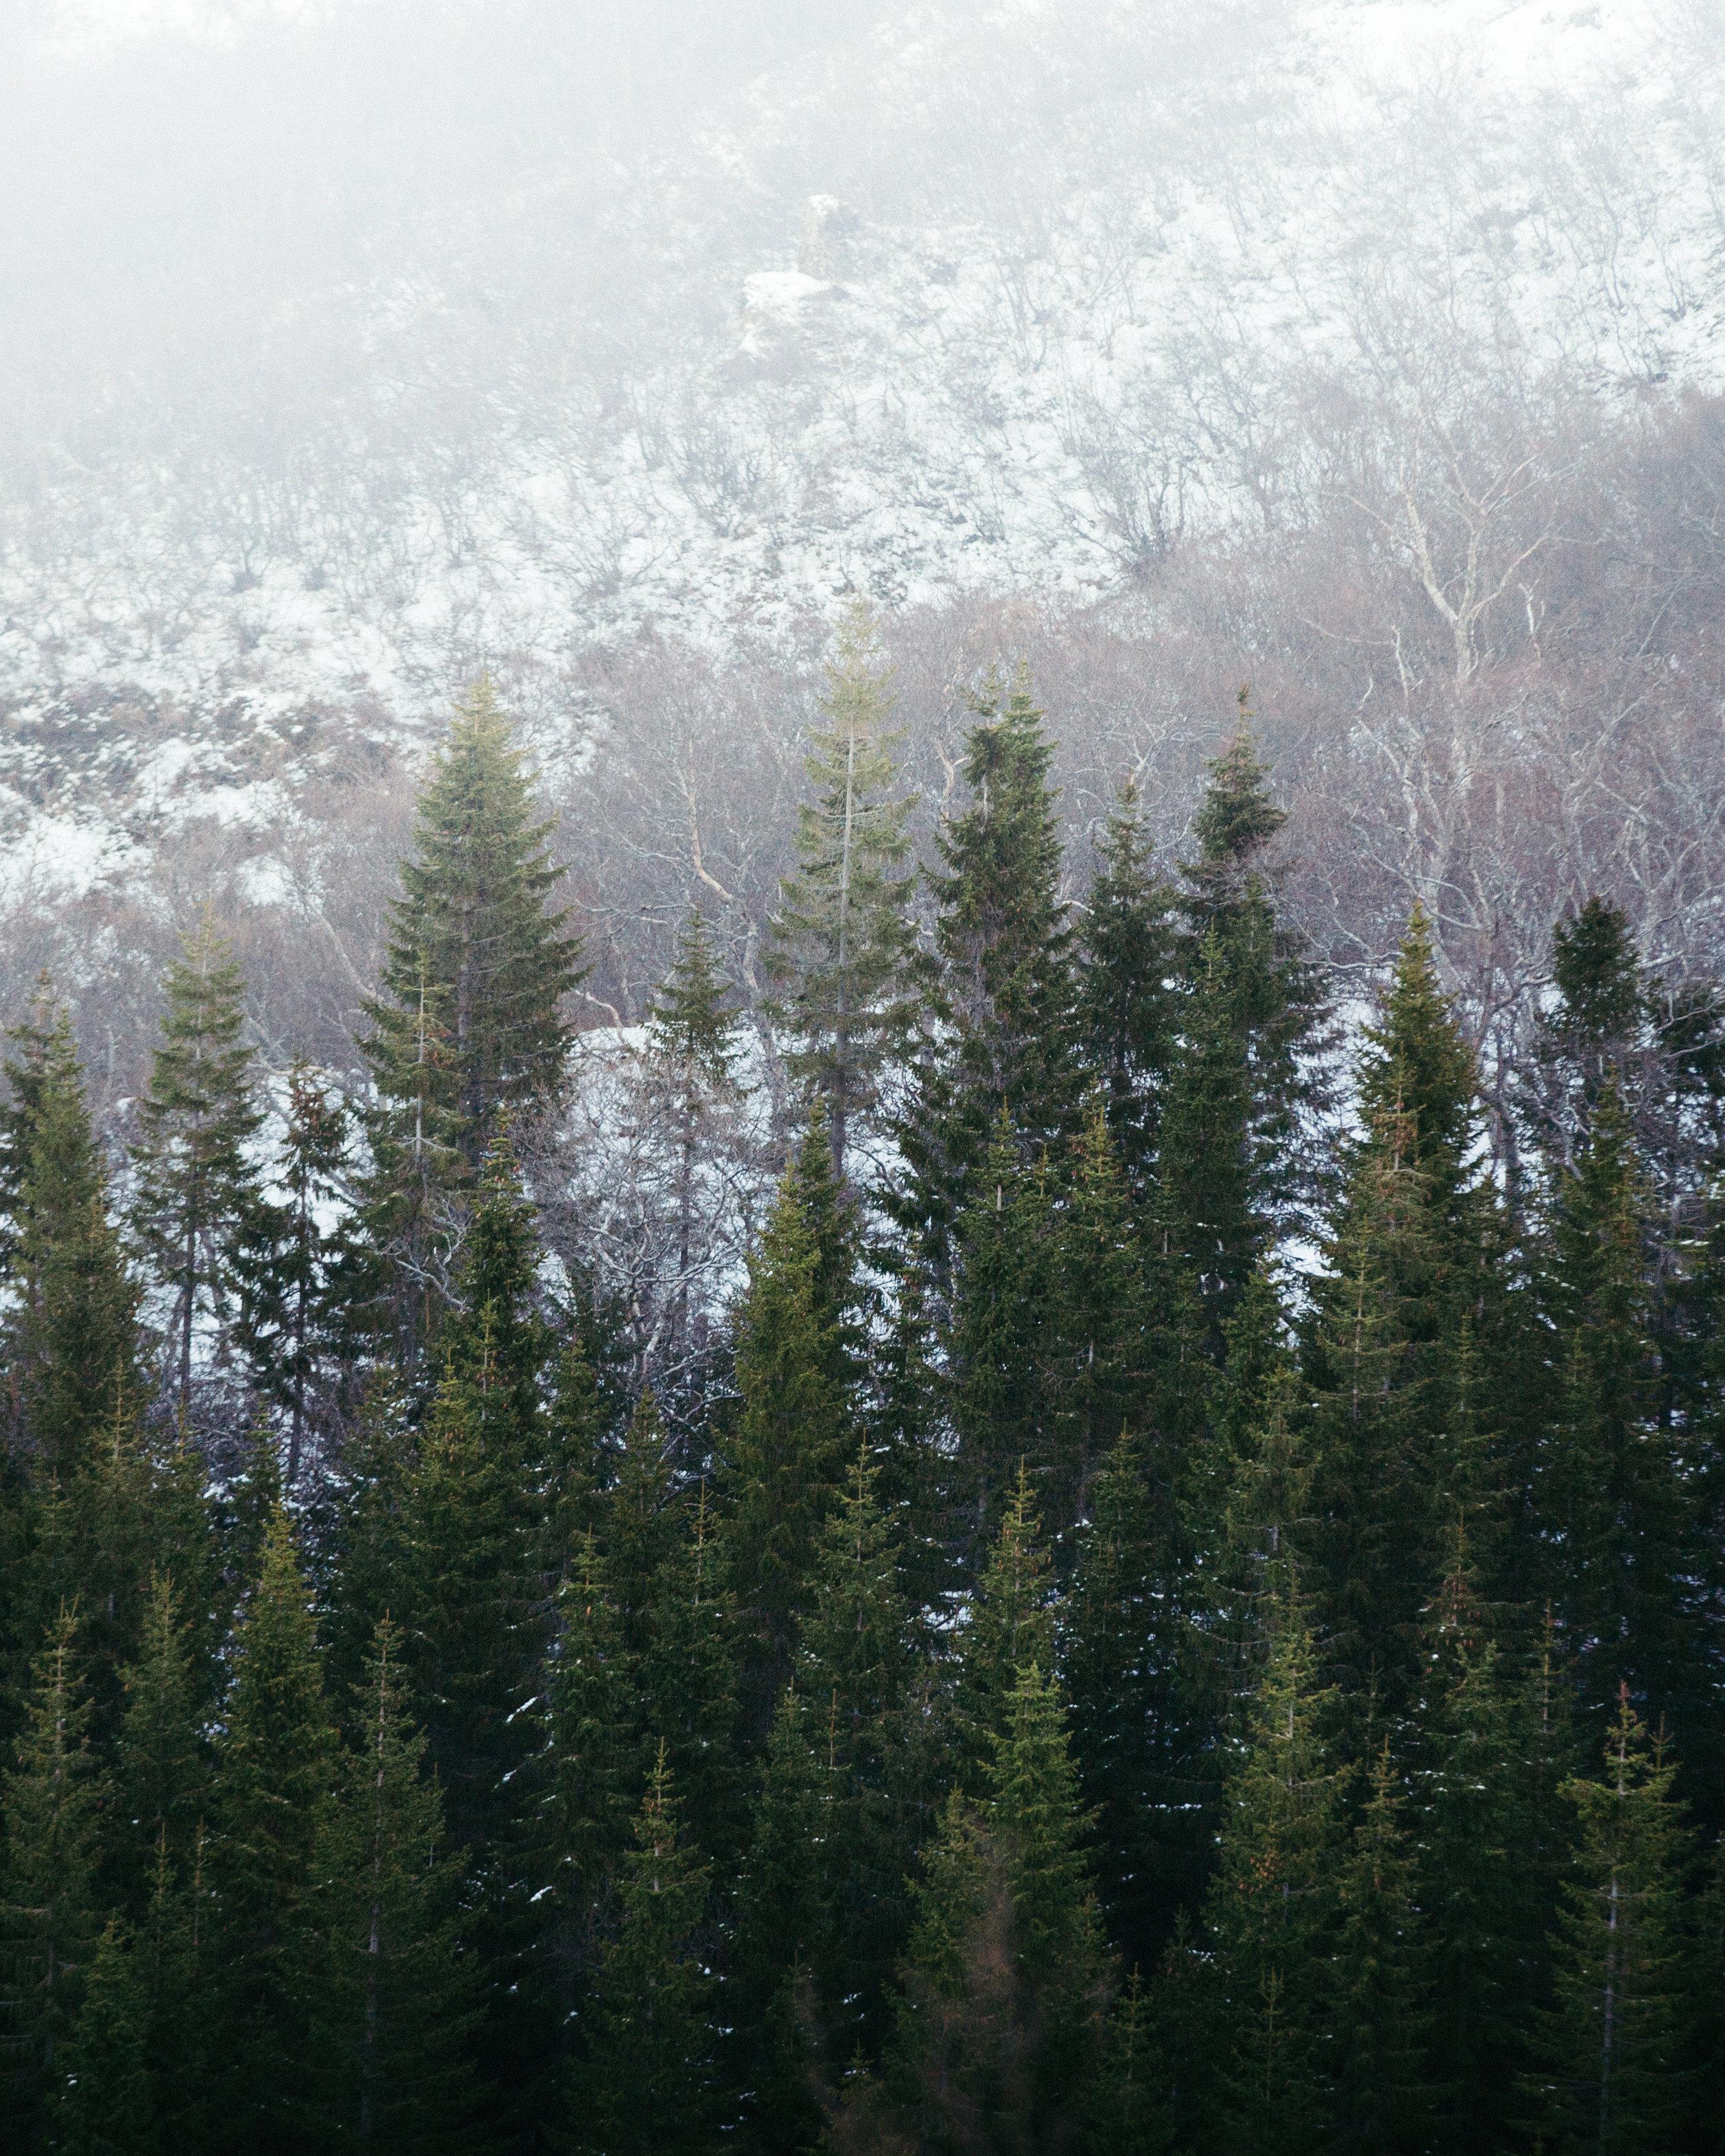 jermiah-schuster-iceland-199.jpg